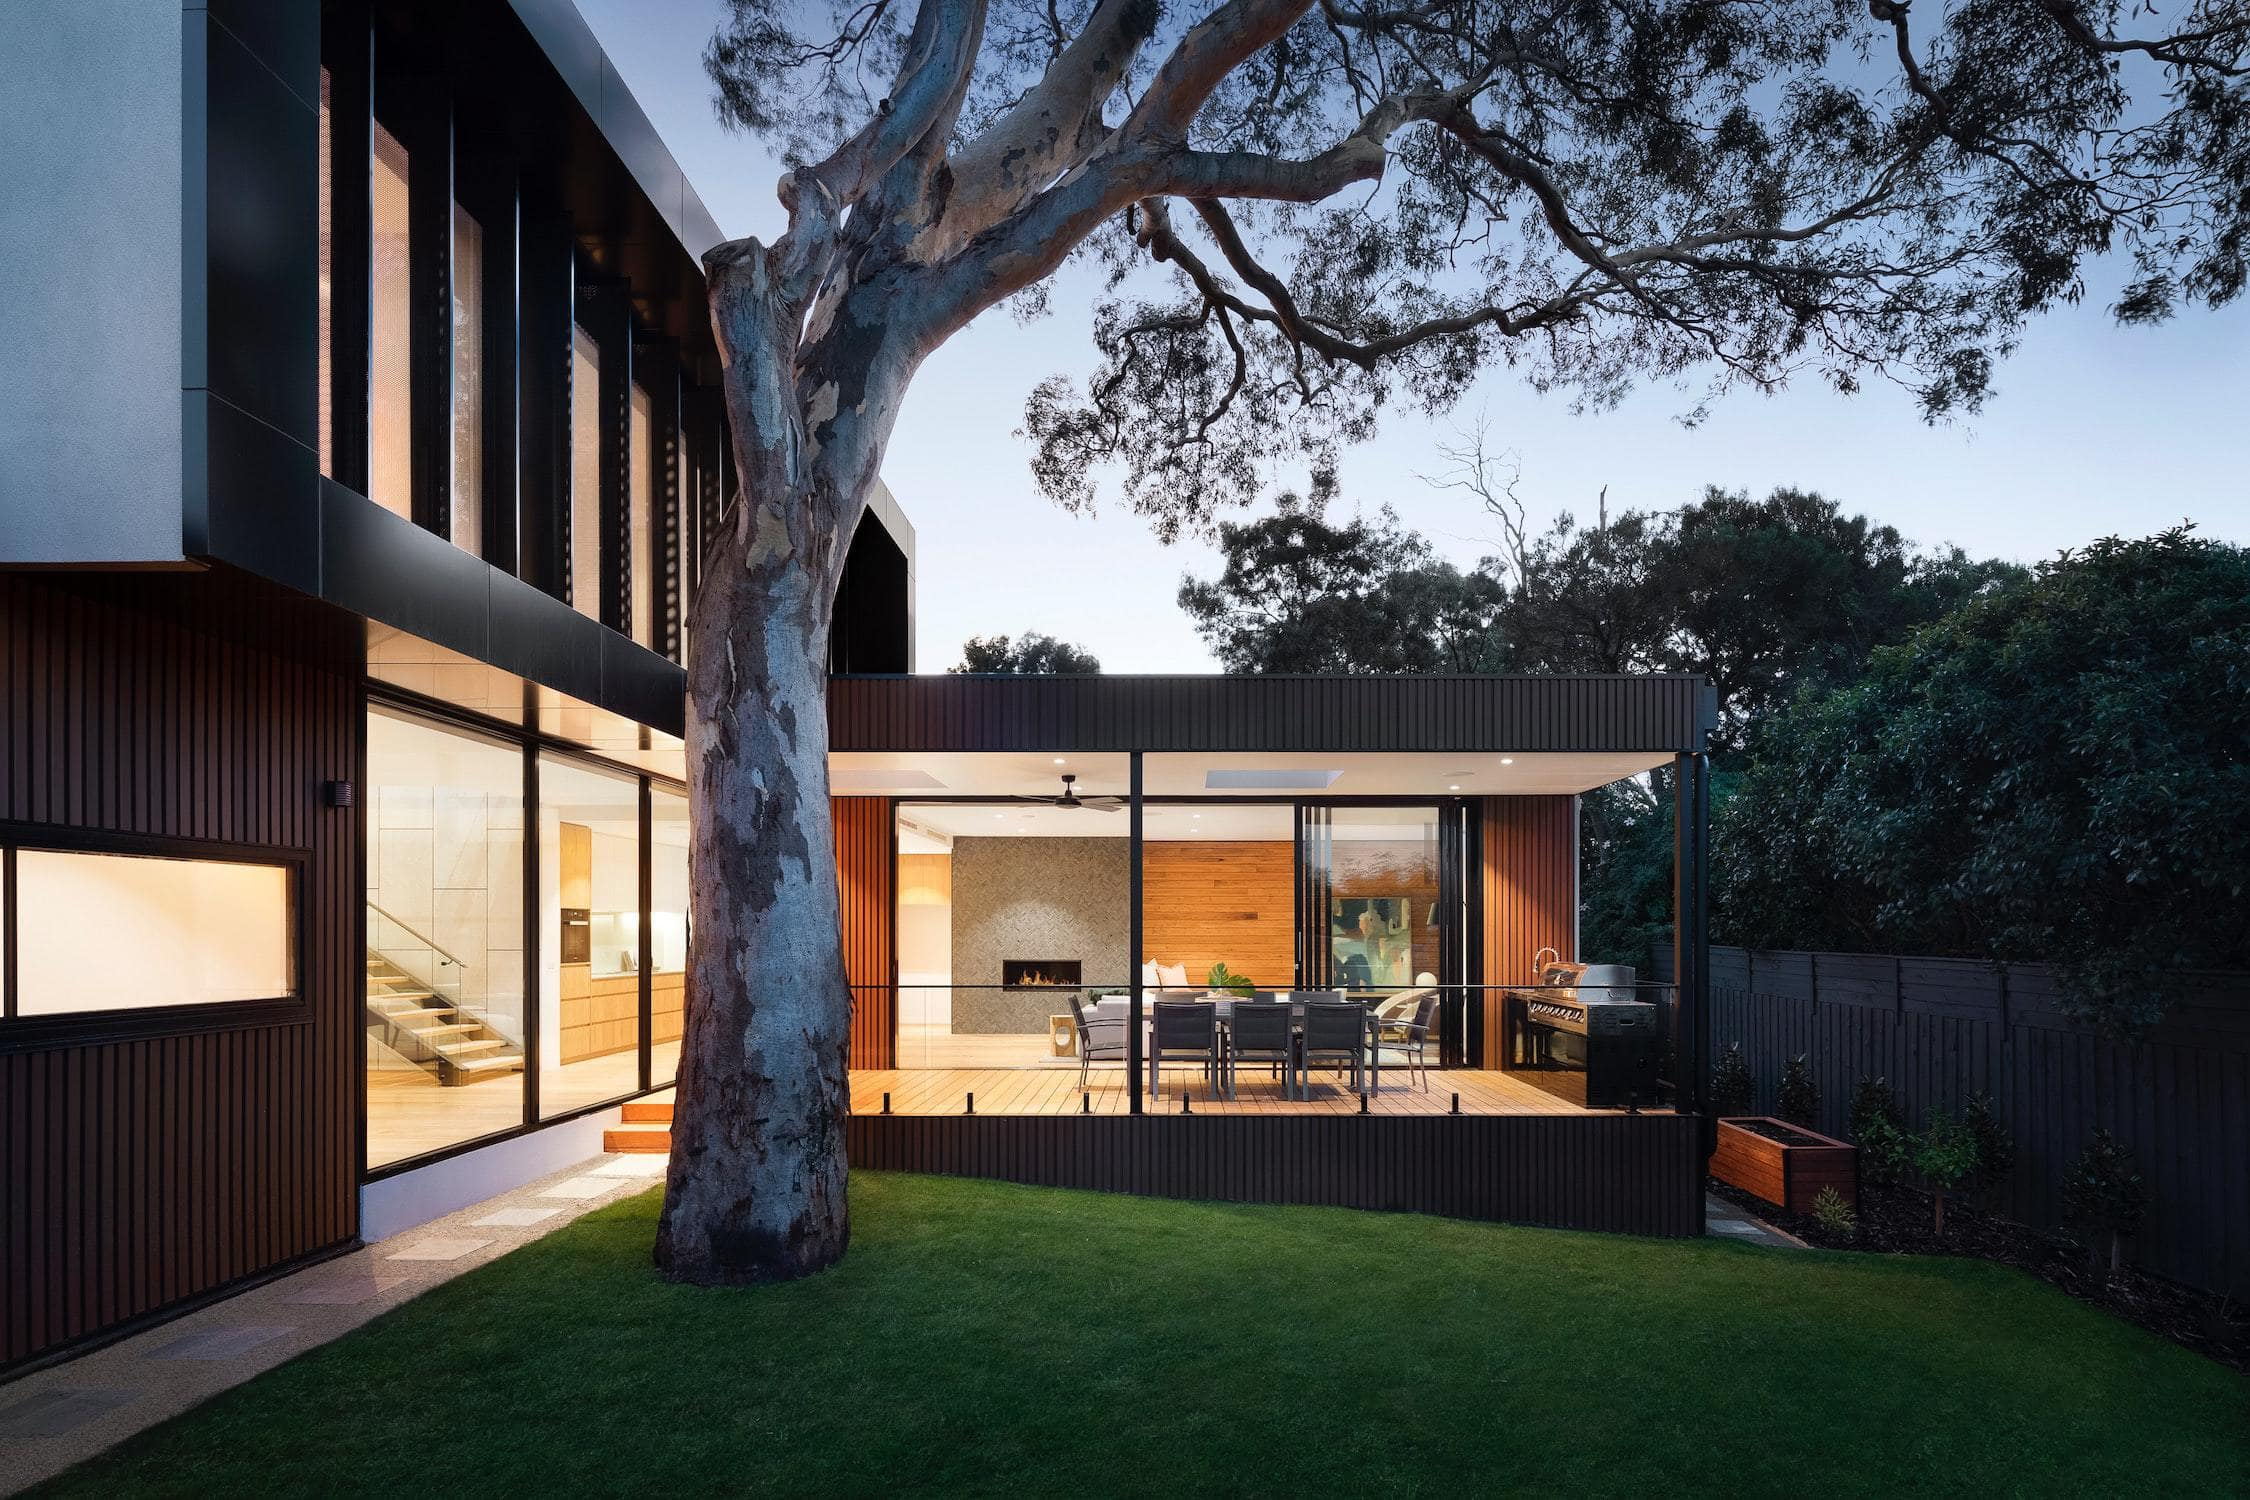 property development financing guide australia